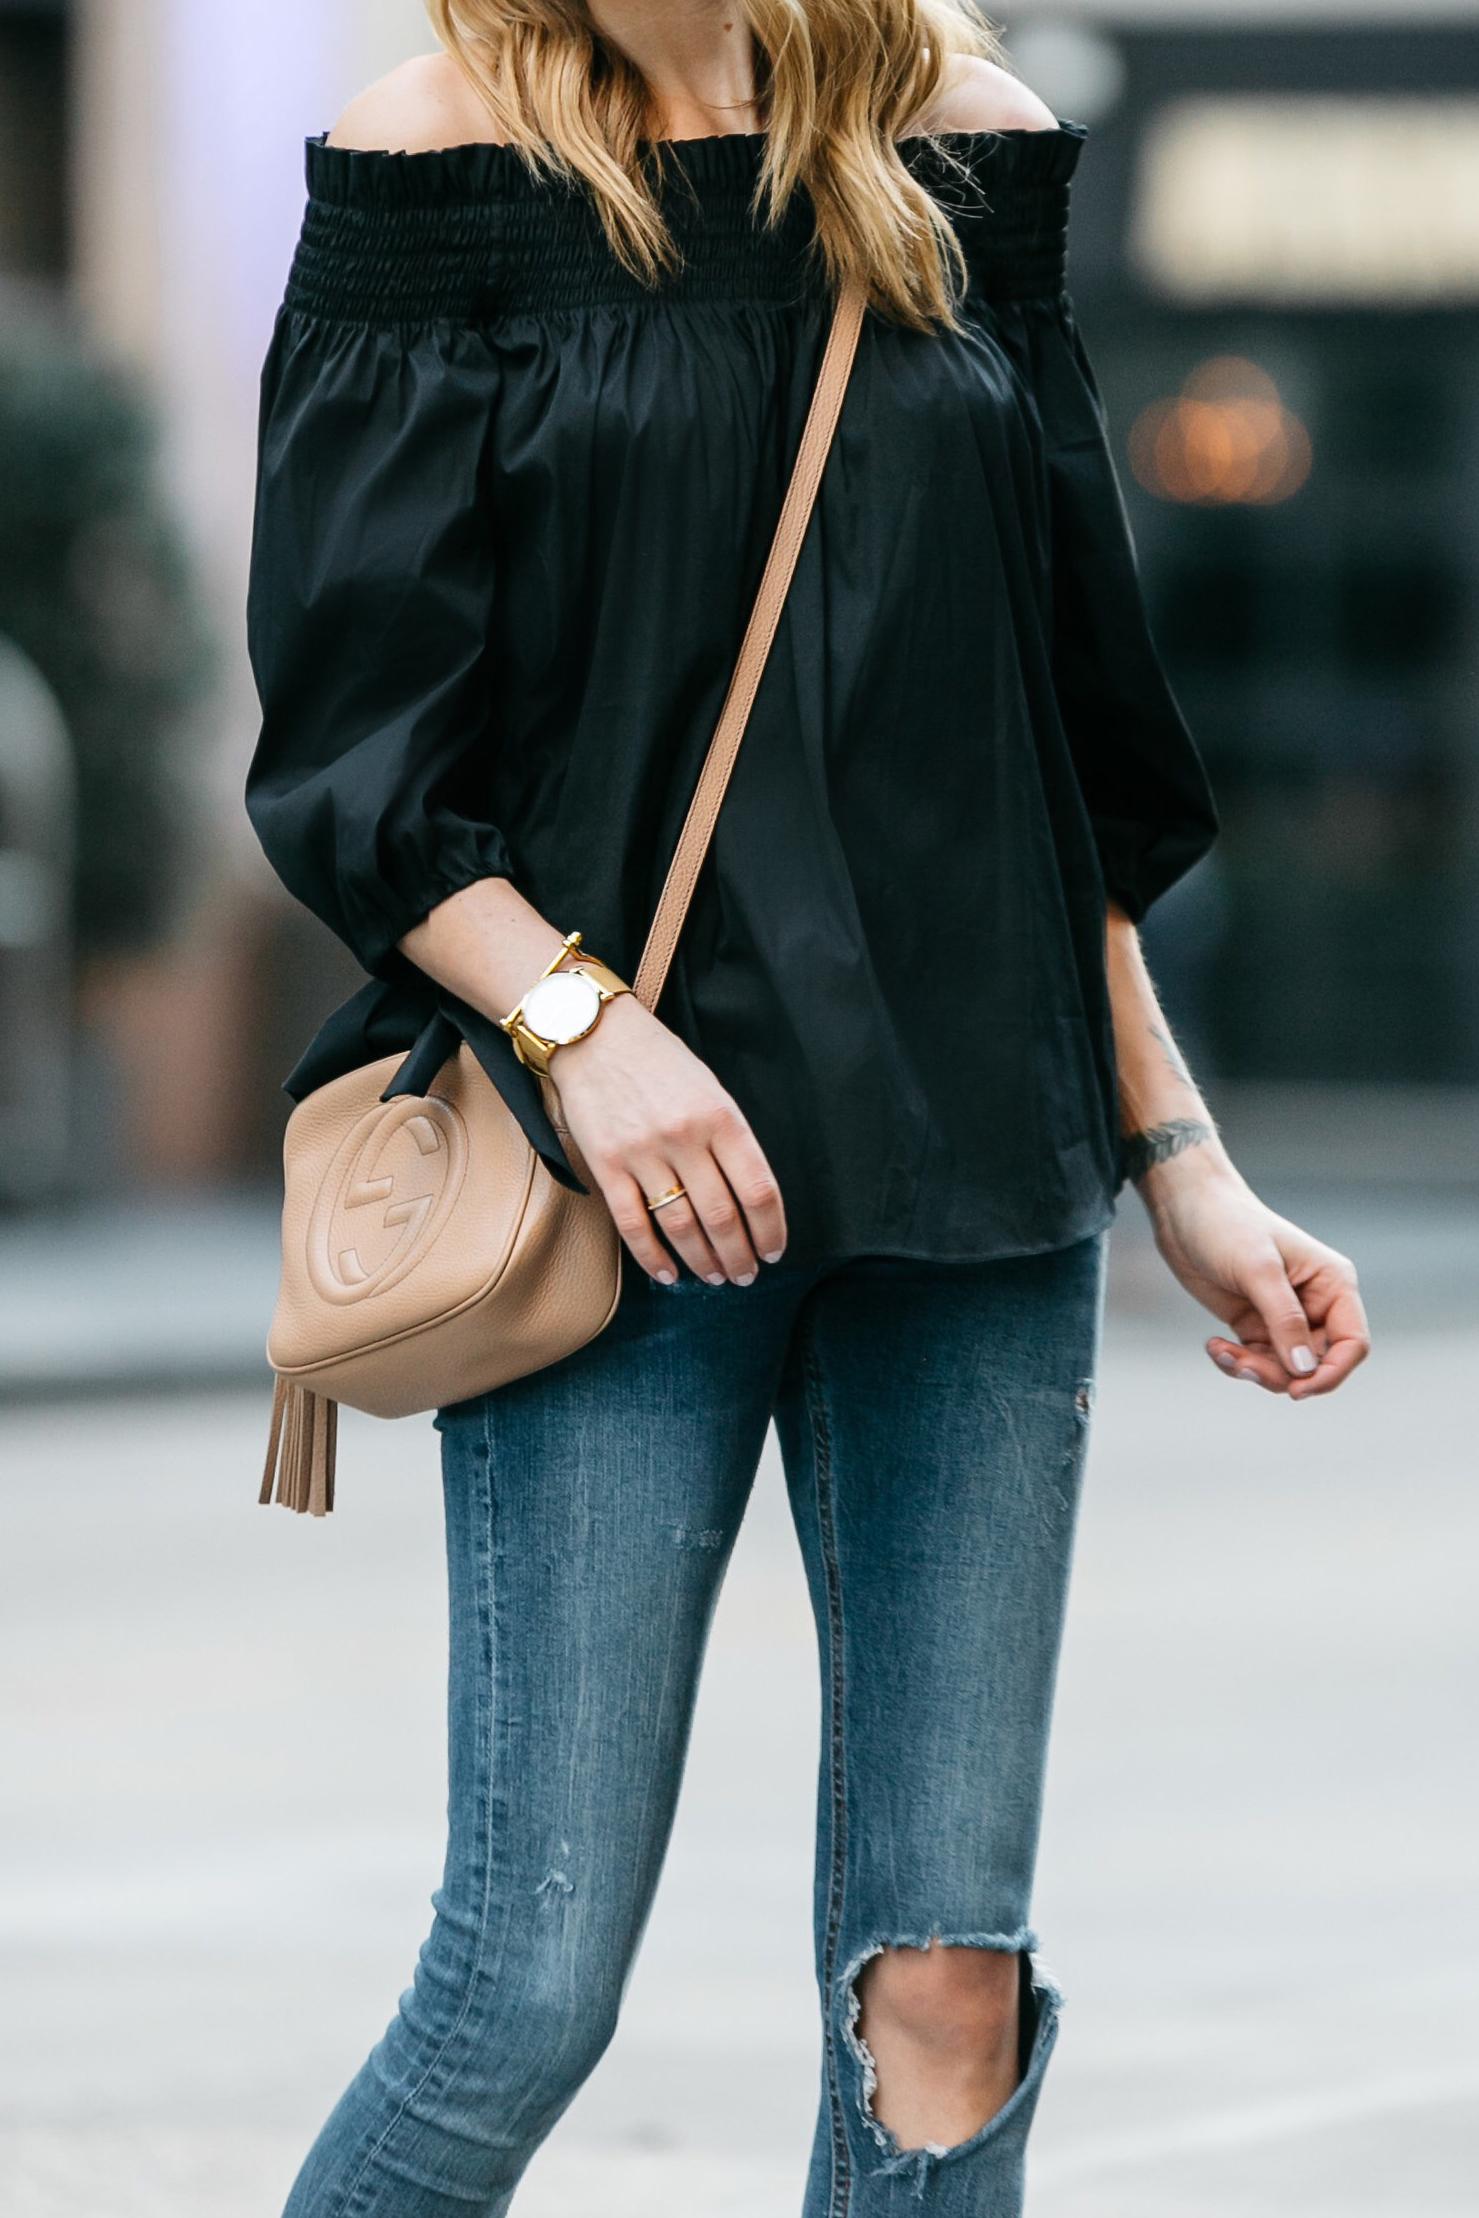 Fashion Jackson, Dallas Blogger, Fashion Blogger, Street Style, Caroline Constas Lou Off the Shoulder Top Black, Denim Ripped Skinny Jeans, Gucci Soho Disco Crossbody